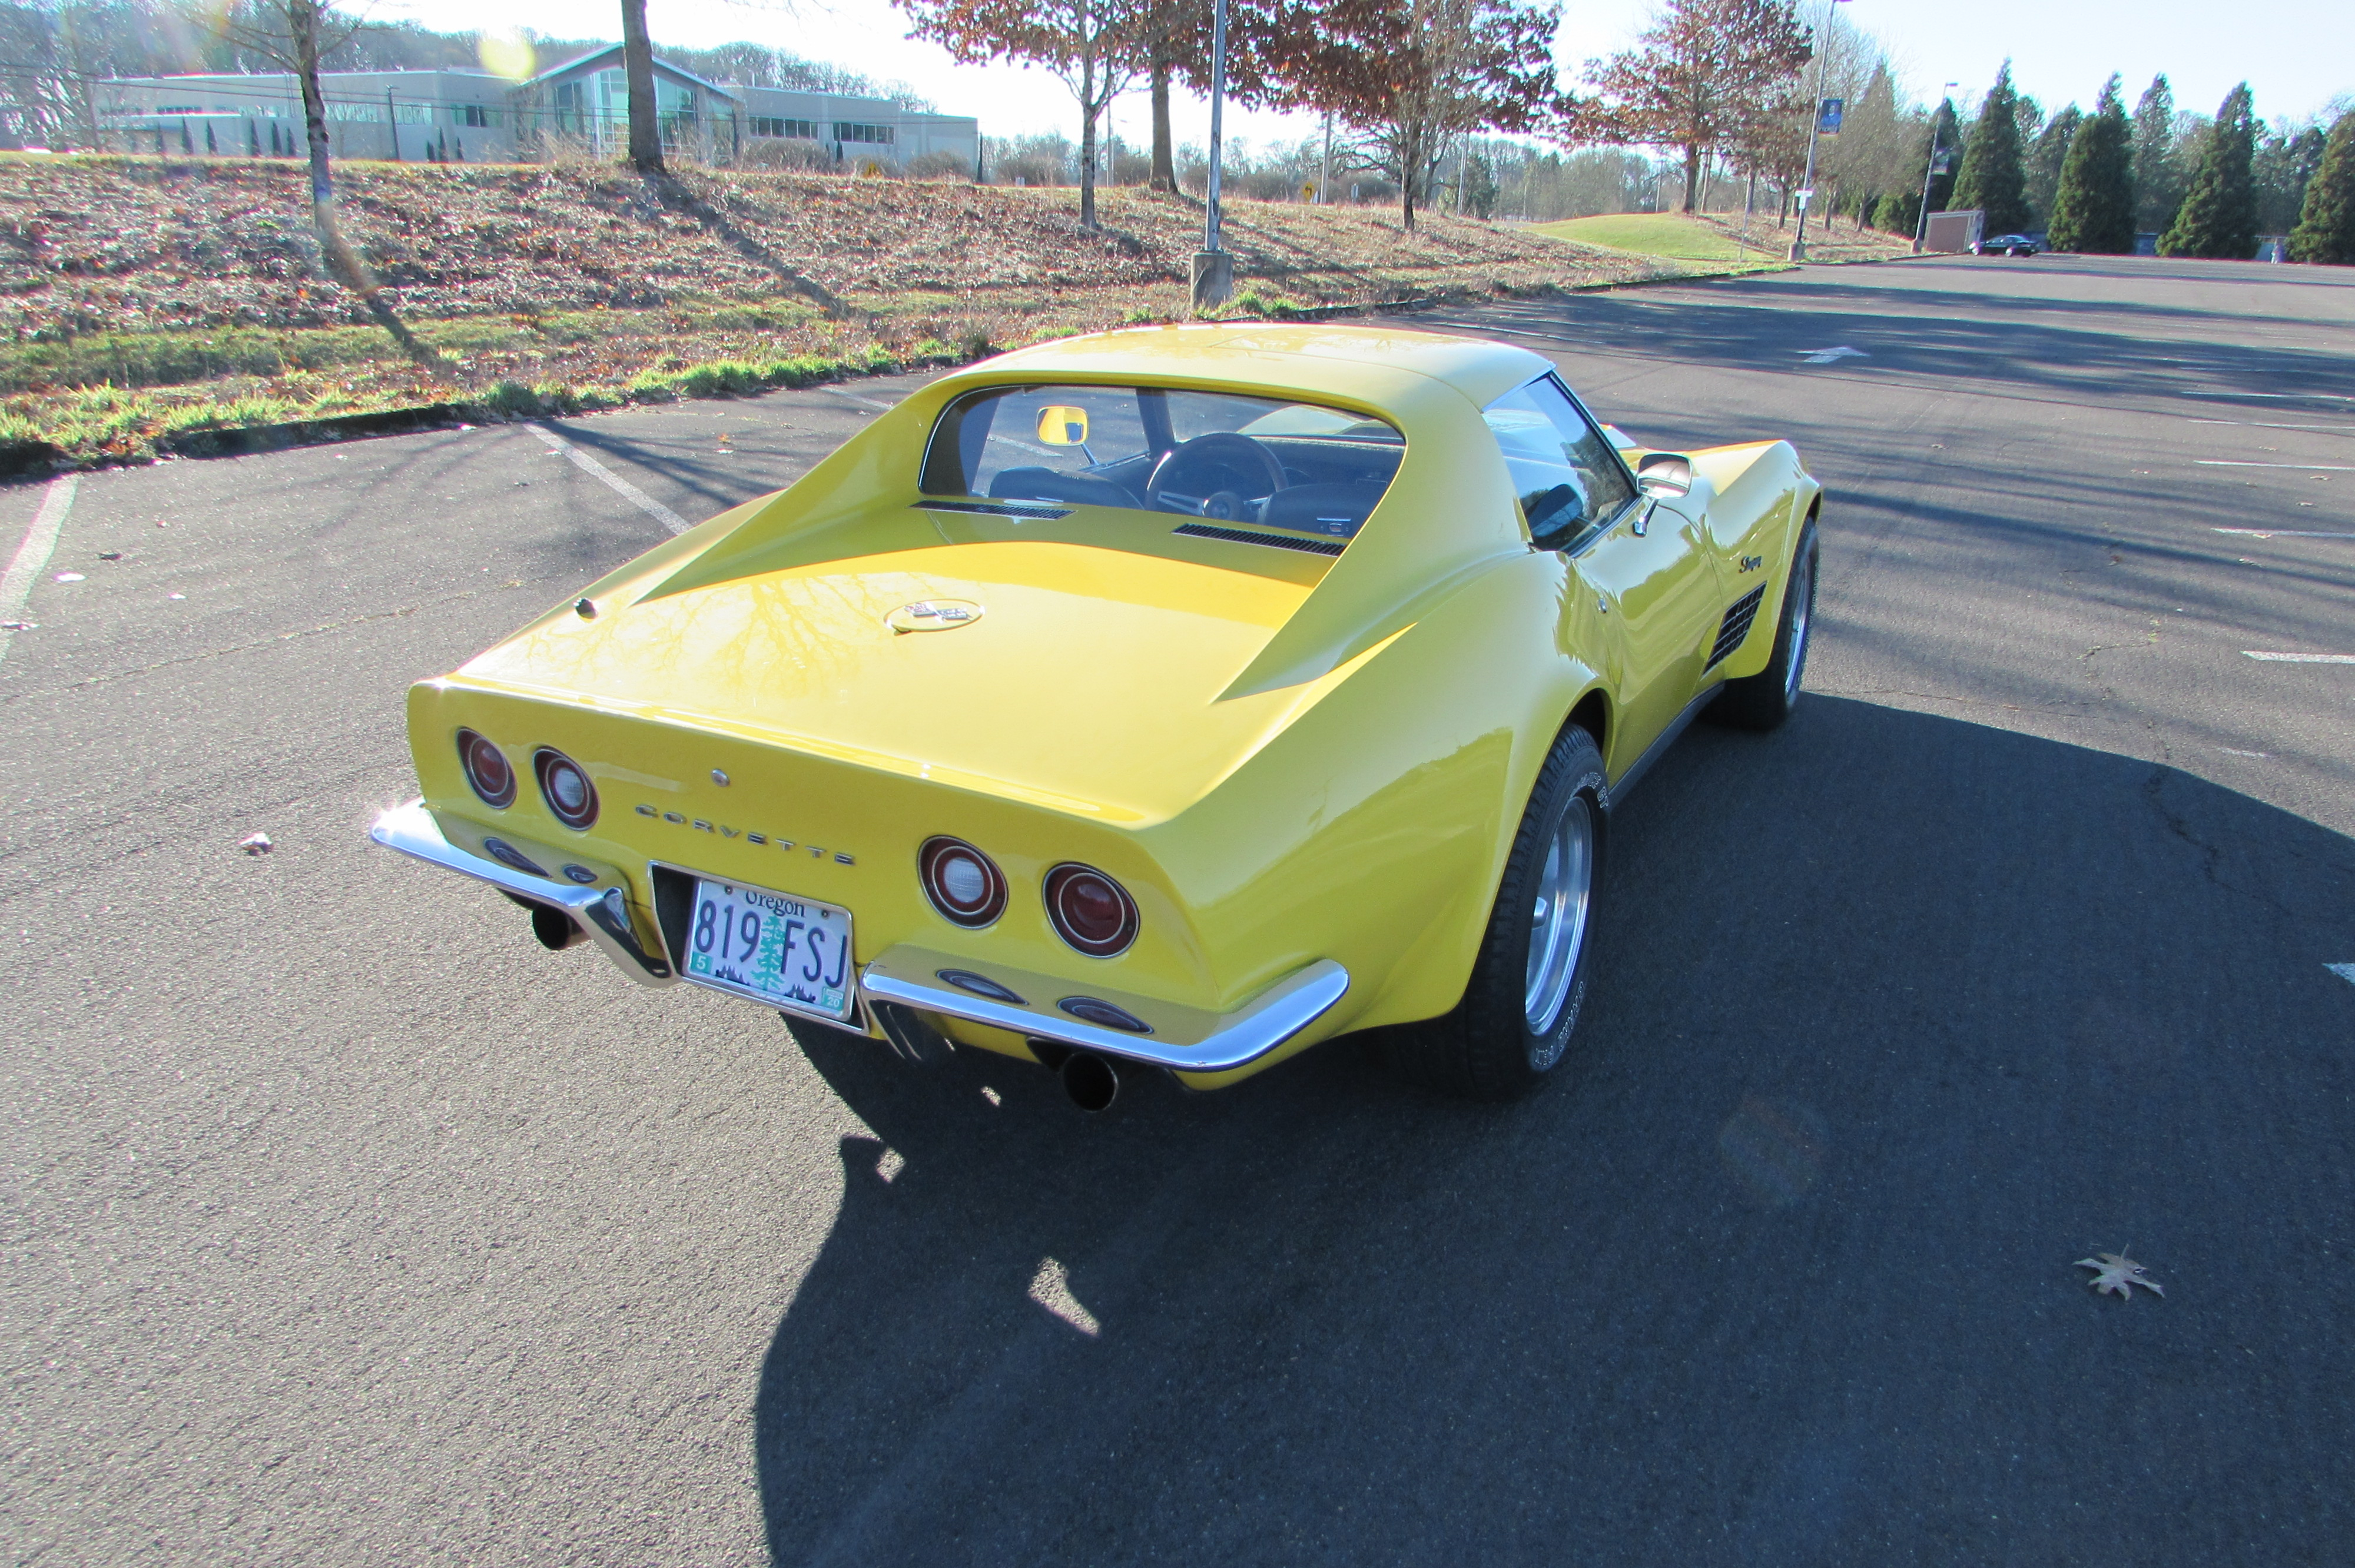 1972 Chevrolet Corvette Stingray Yellow